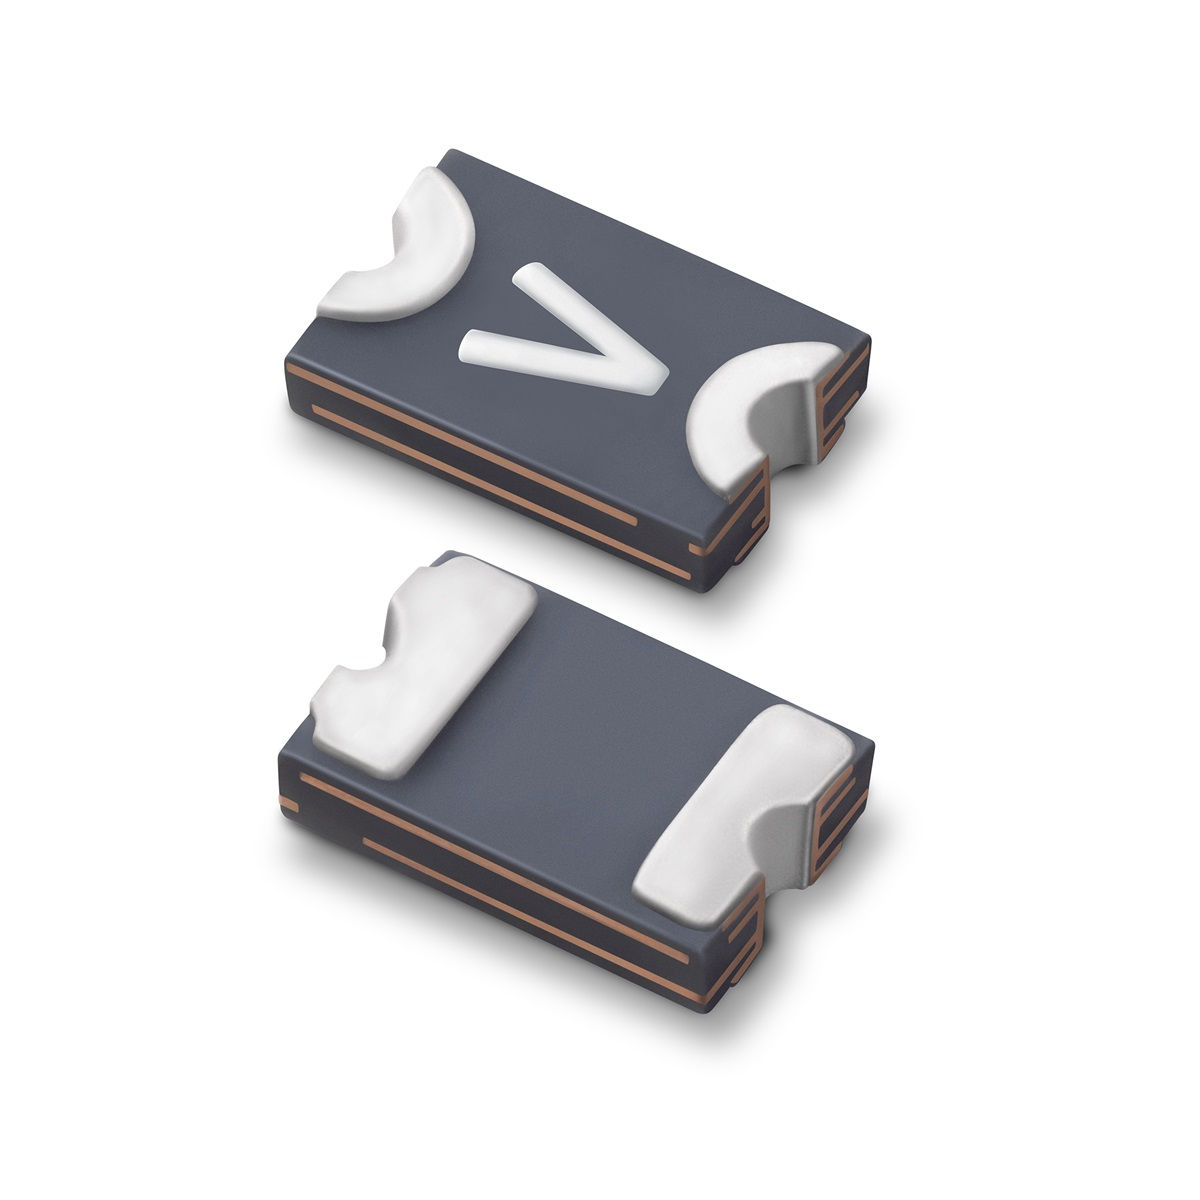 Littelfuse setP温度指示器可进一步预防USB Type C型连接器因过热而损坏